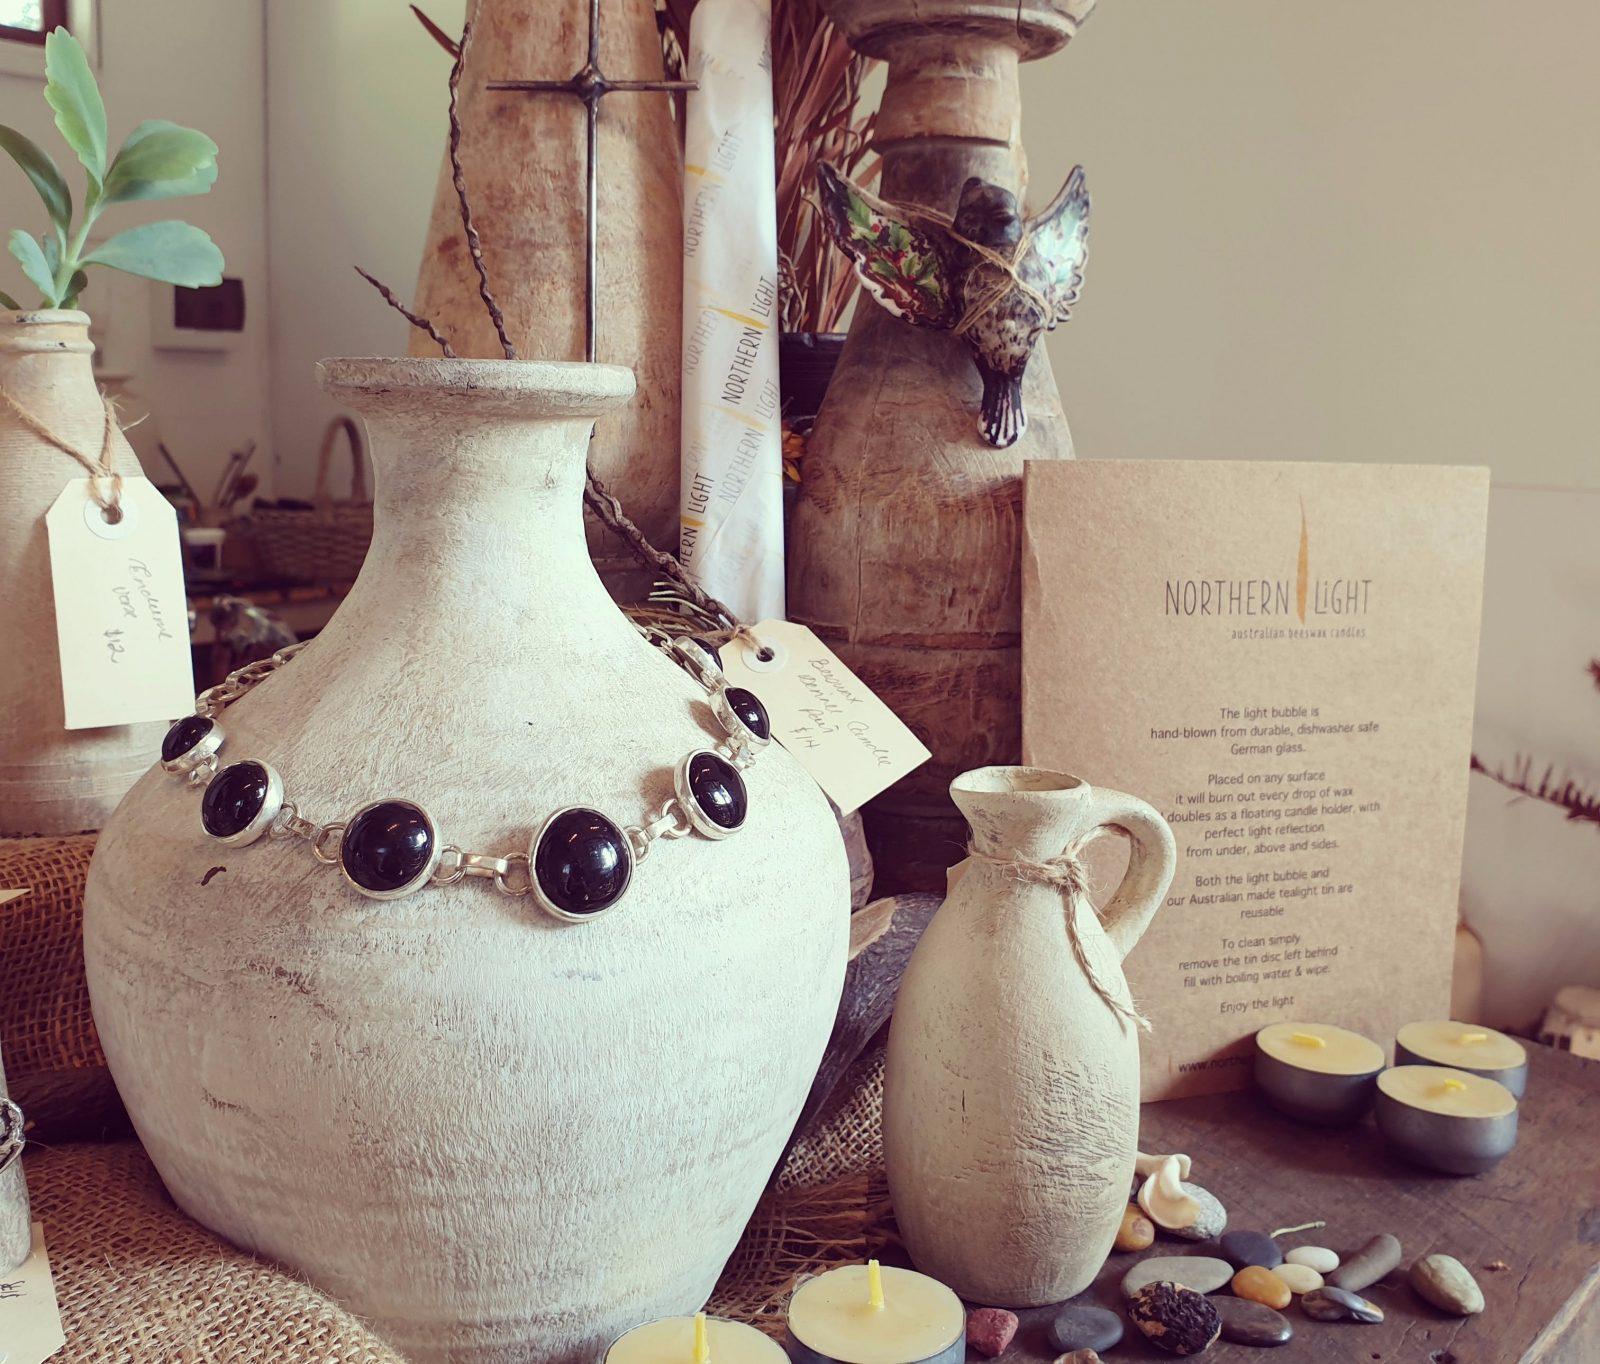 Handcrafted jewellery made in Tyalgum